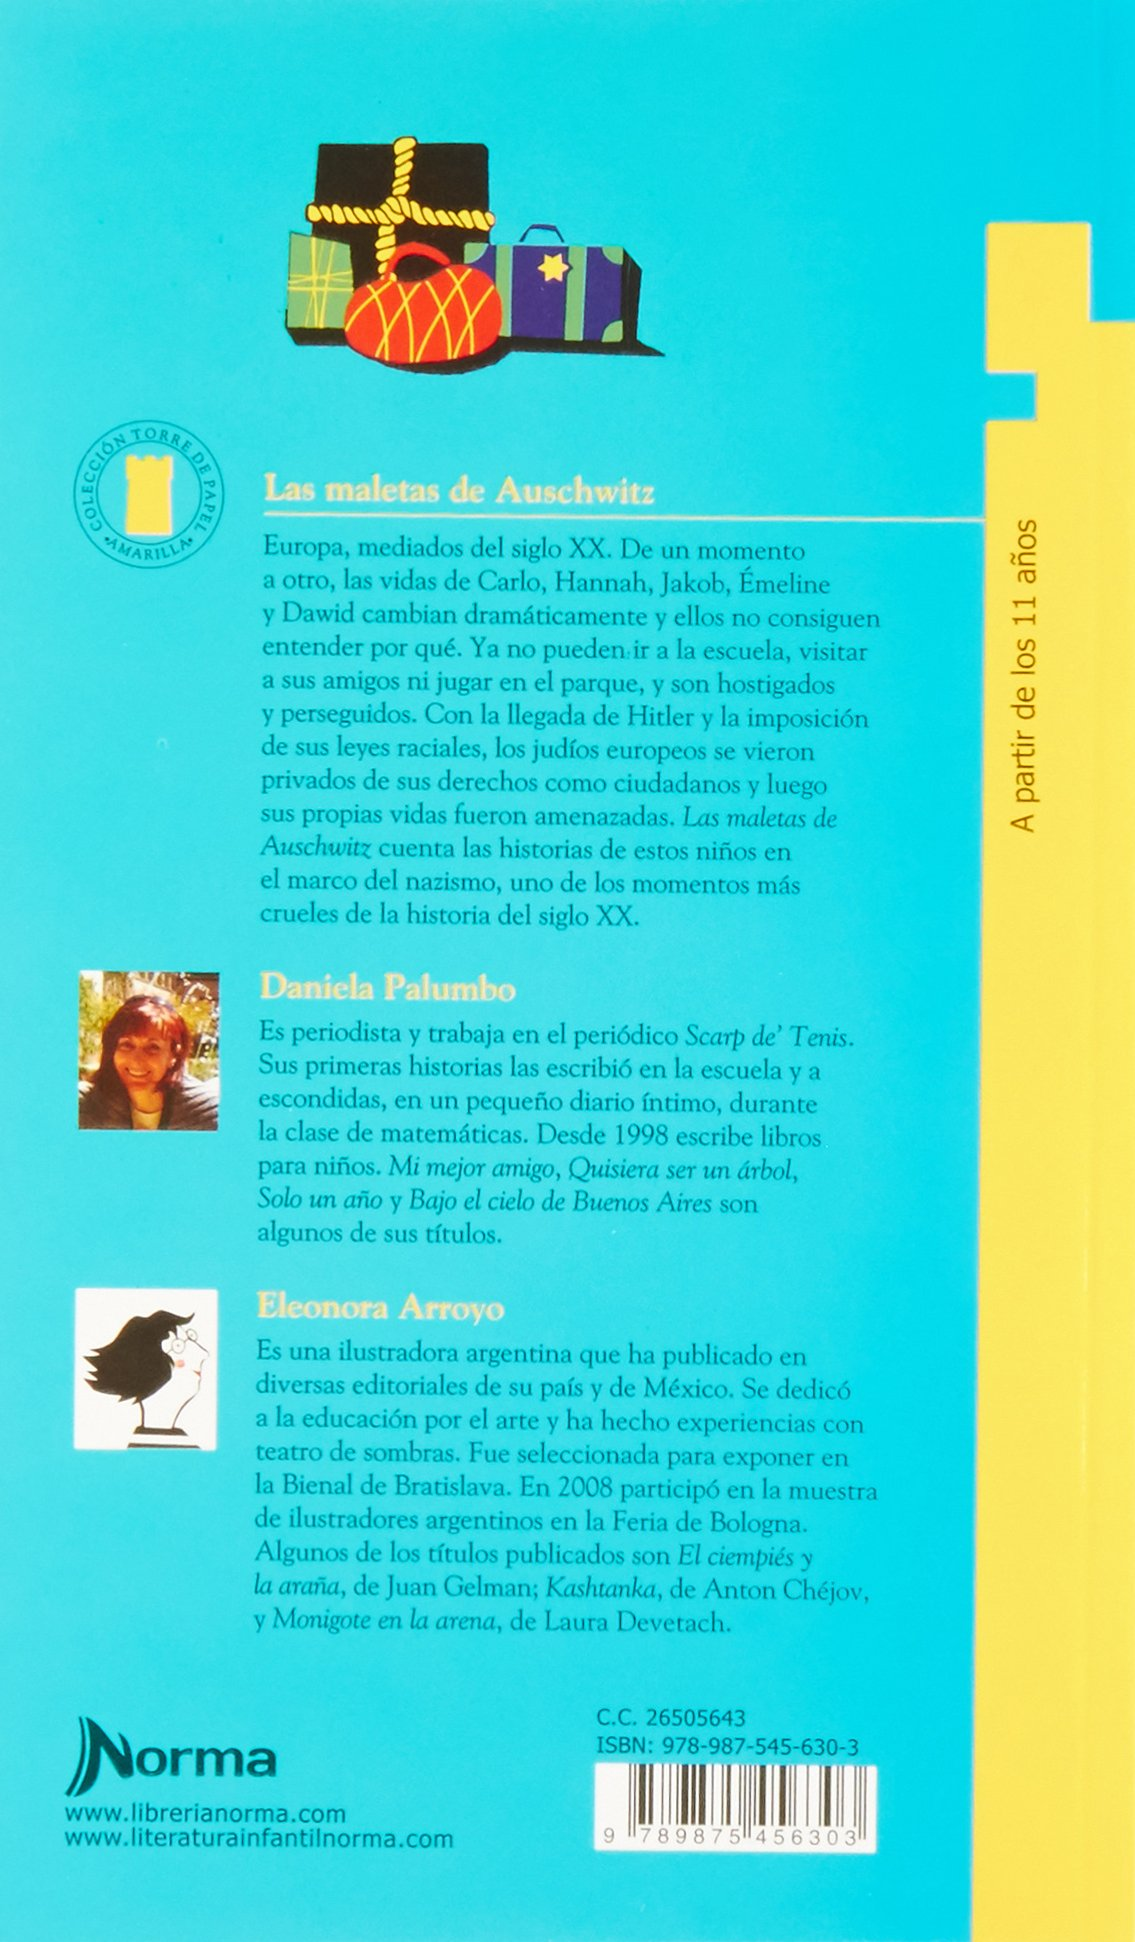 MALETAS DE AUSCHWITZ, LAS - T.P. AMARILLA: DANIELA PALUMBO: 9789875456303: Amazon.com: Books